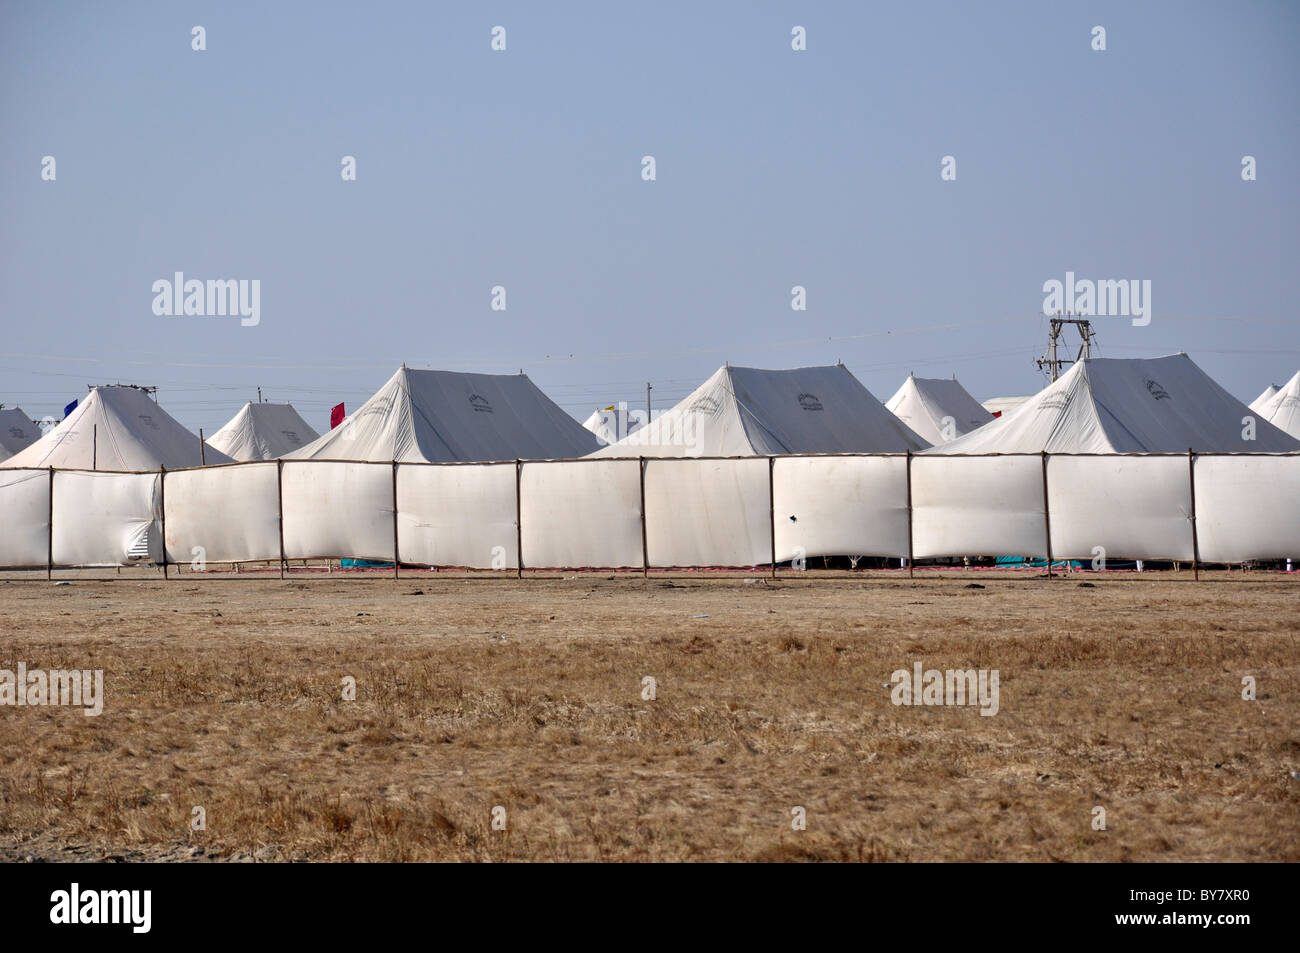 Tent accomodation - Stock Image